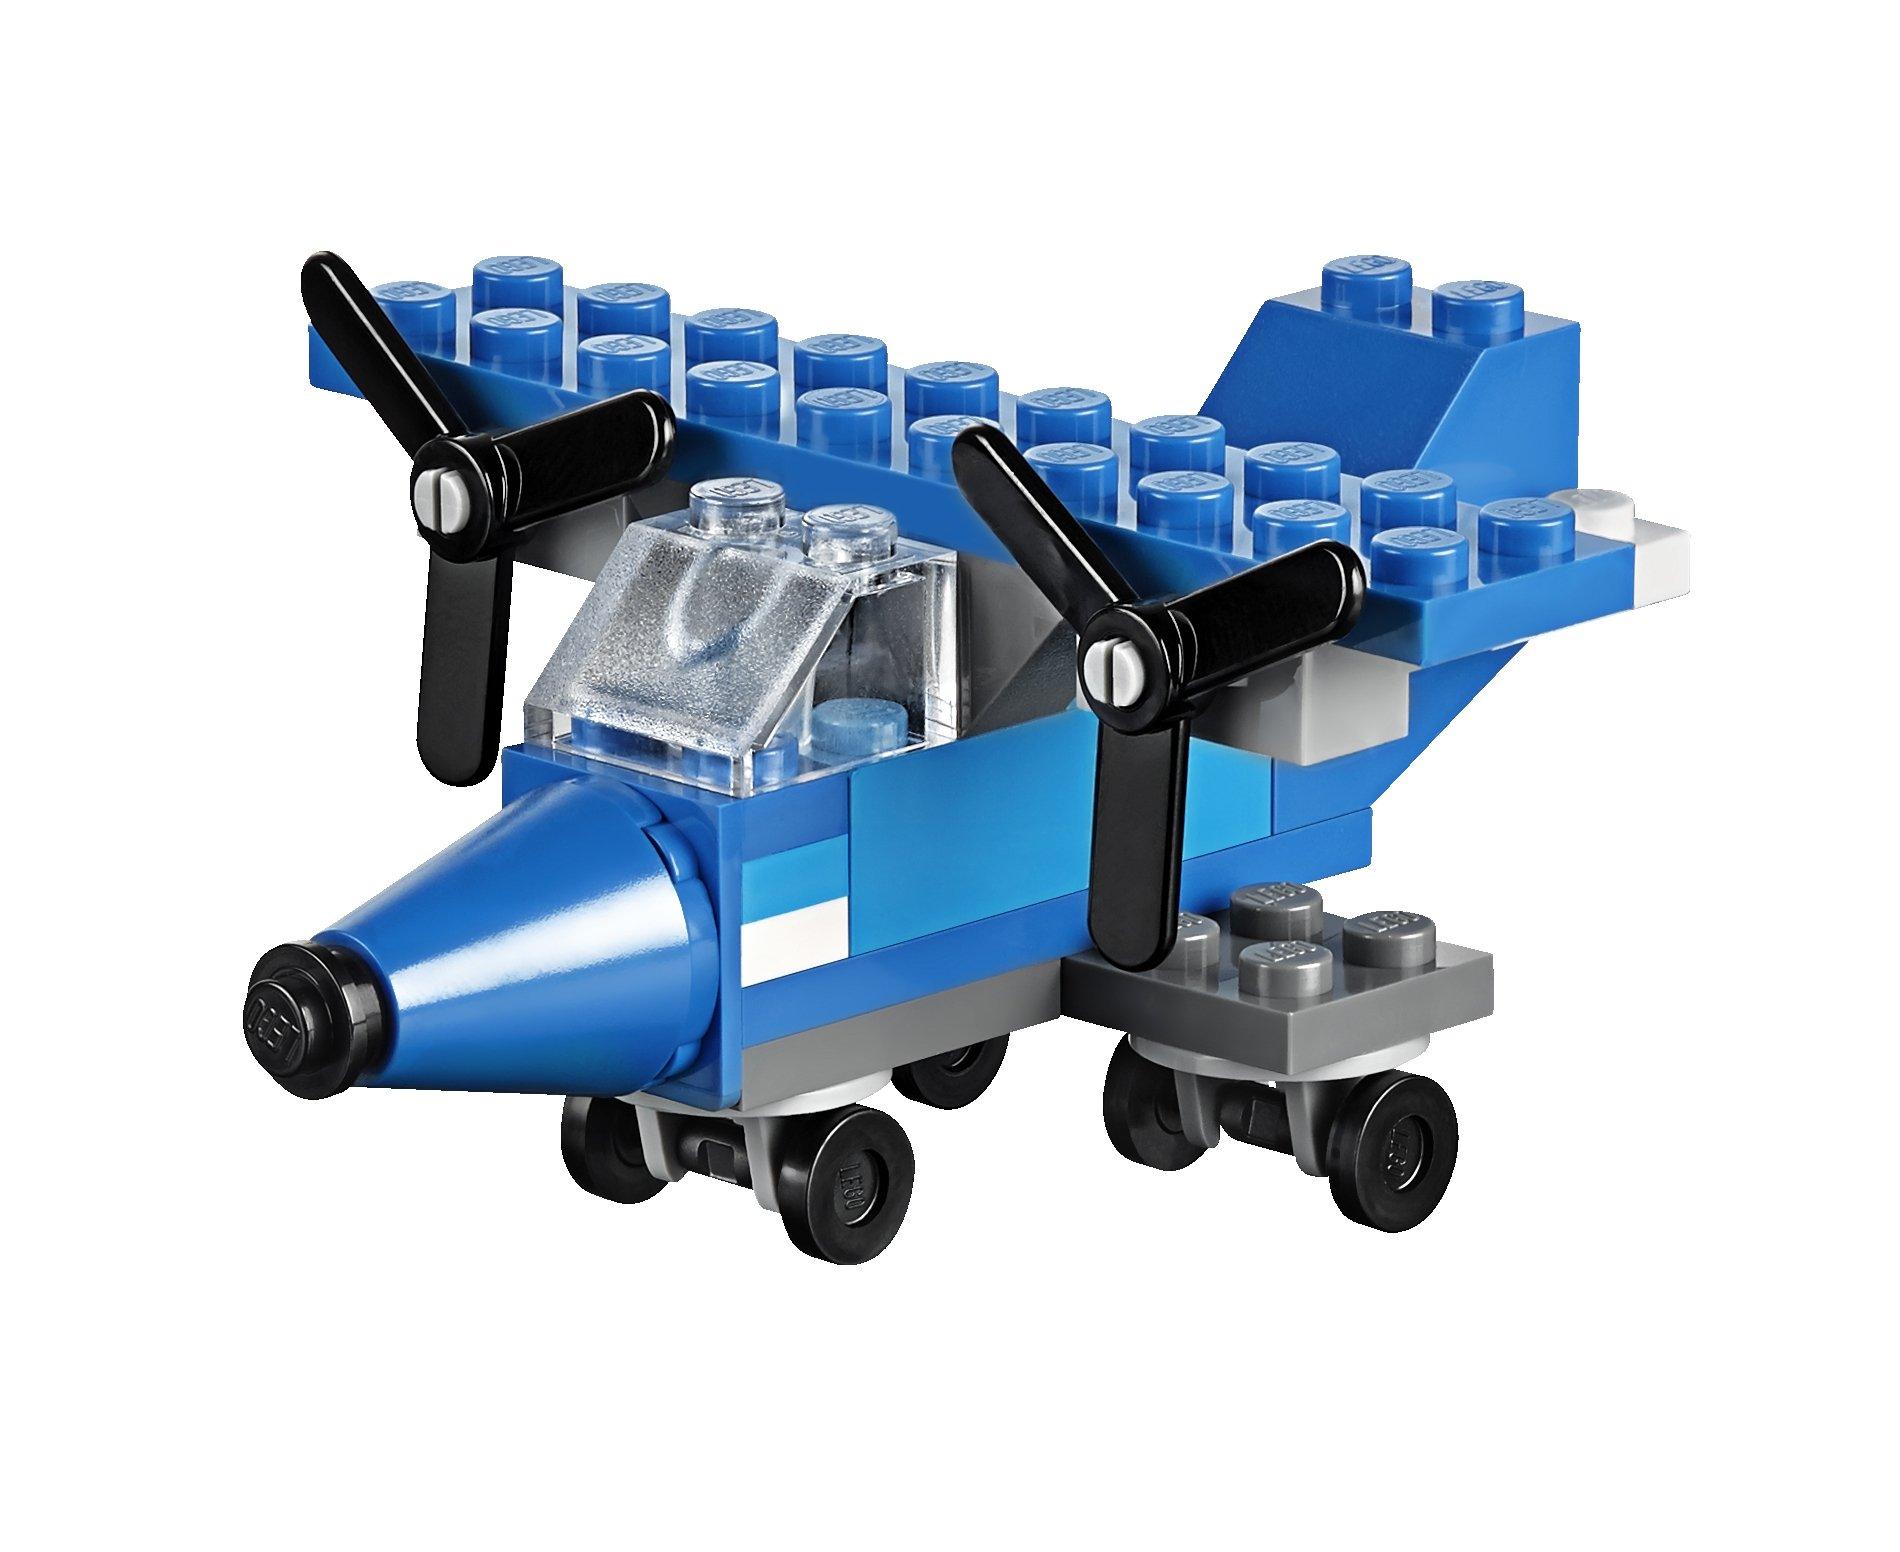 LEGO Classic Creative Bricks 10692 Building Blocks, Learning Toy by LEGO (Image #5)